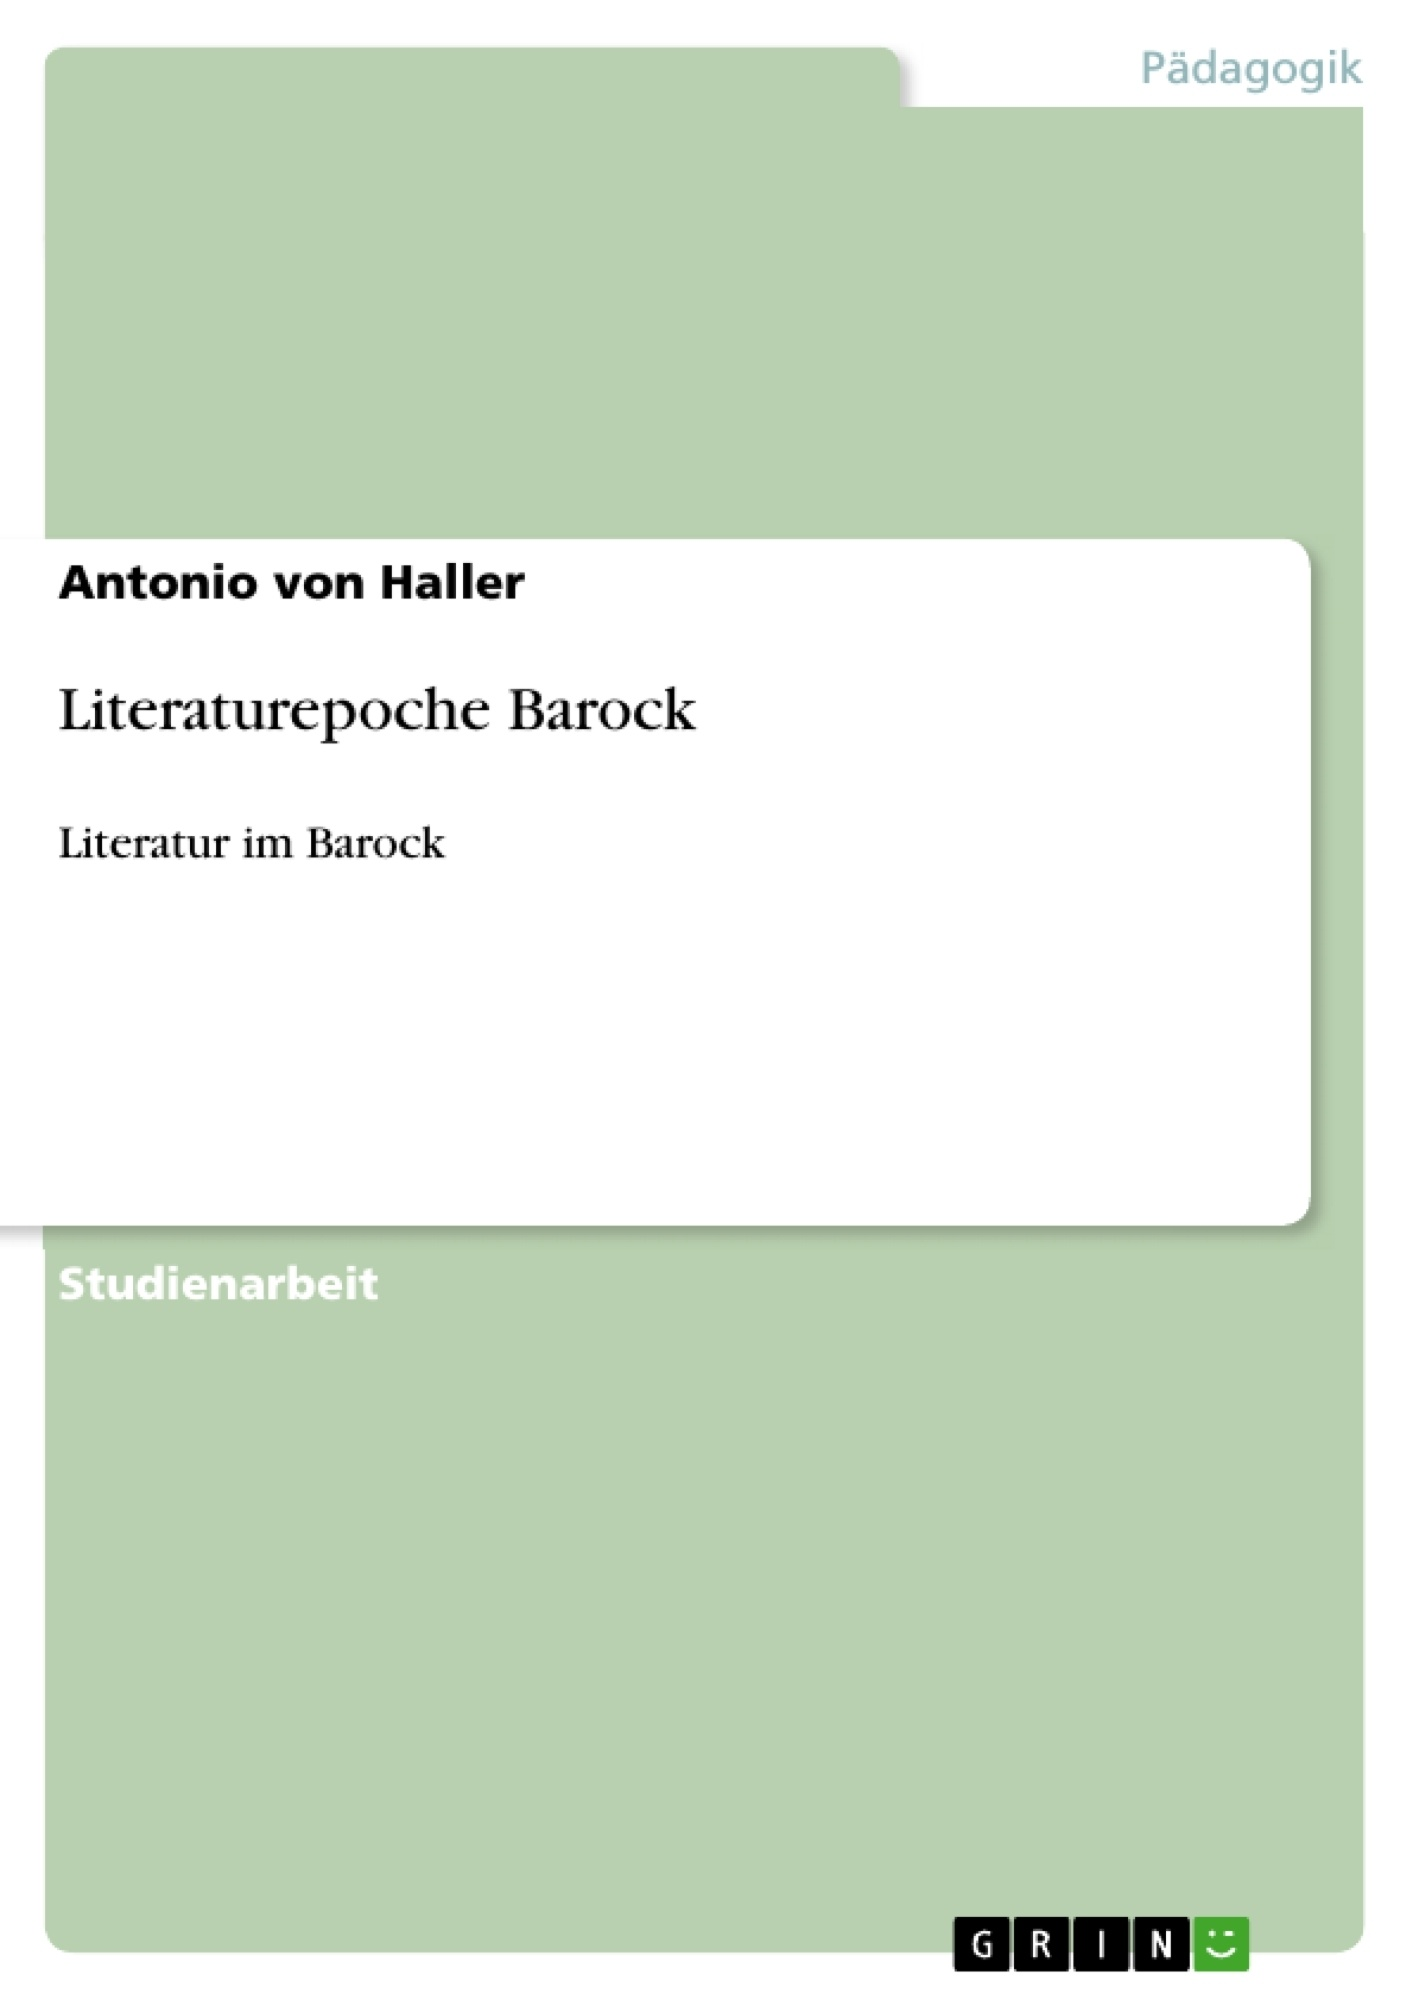 Titel: Literaturepoche Barock